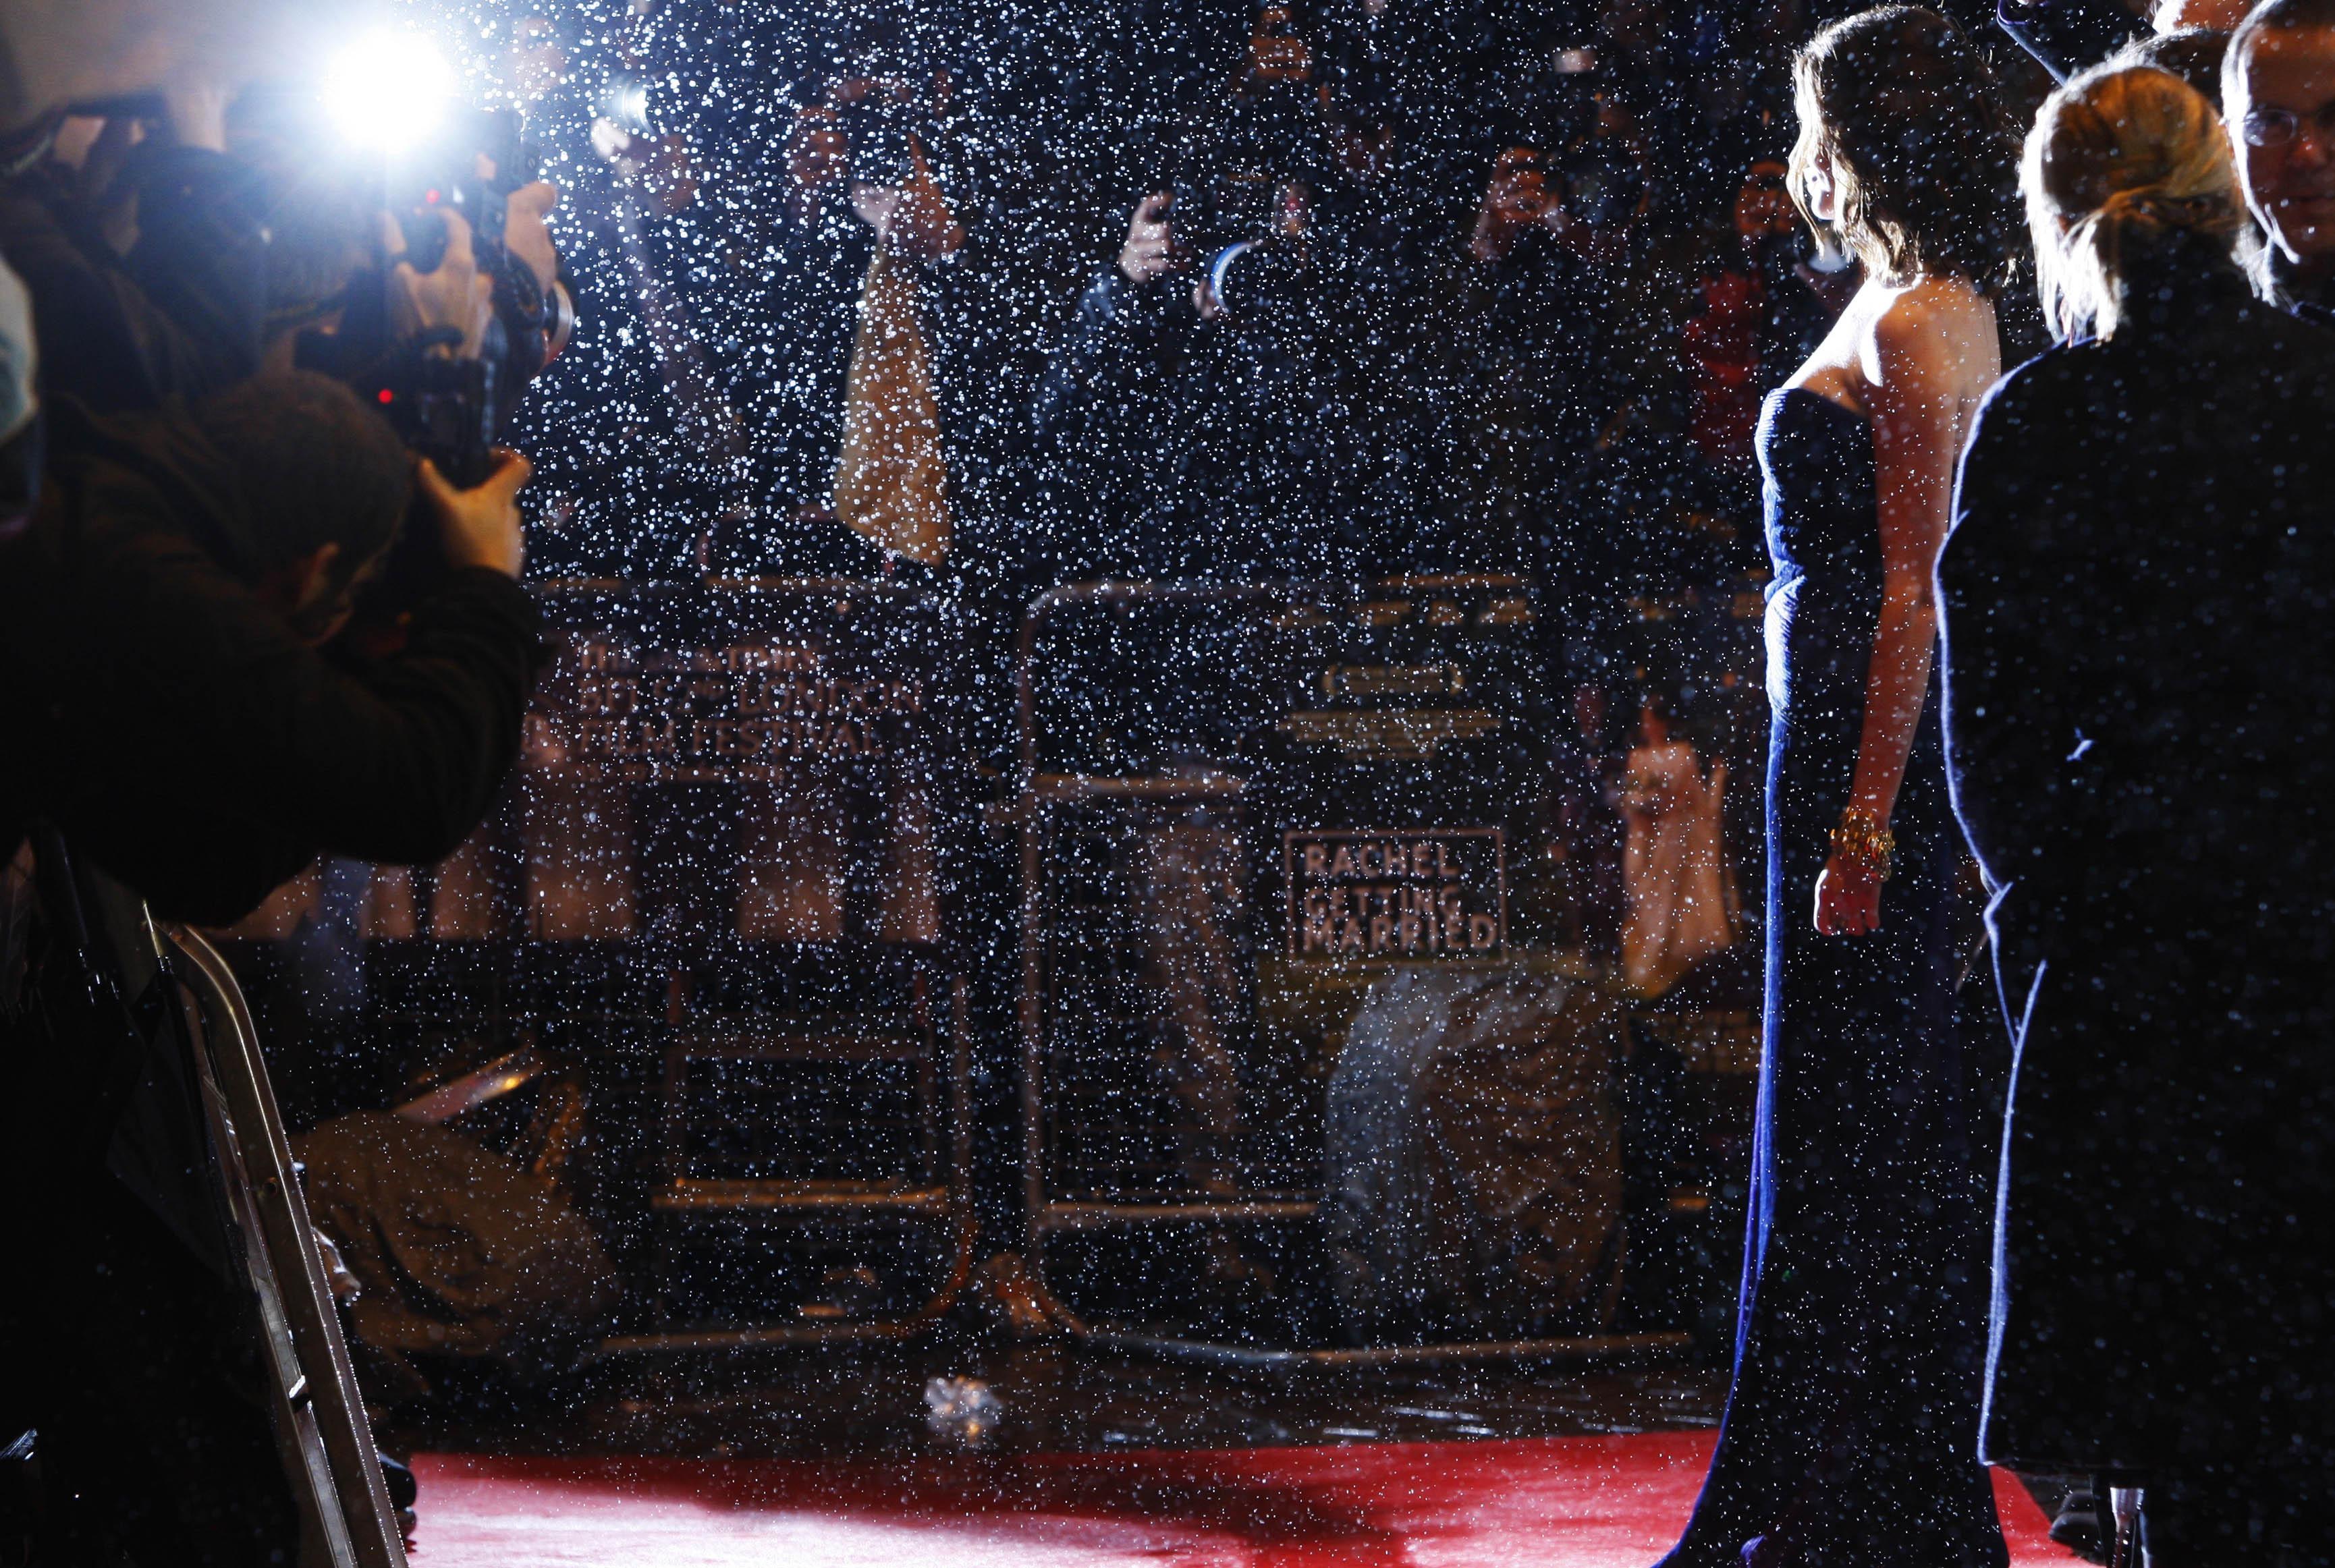 36815_Anne_Hathaway-Rachel_Getting_Married_premiere-031_122_855lo.jpg